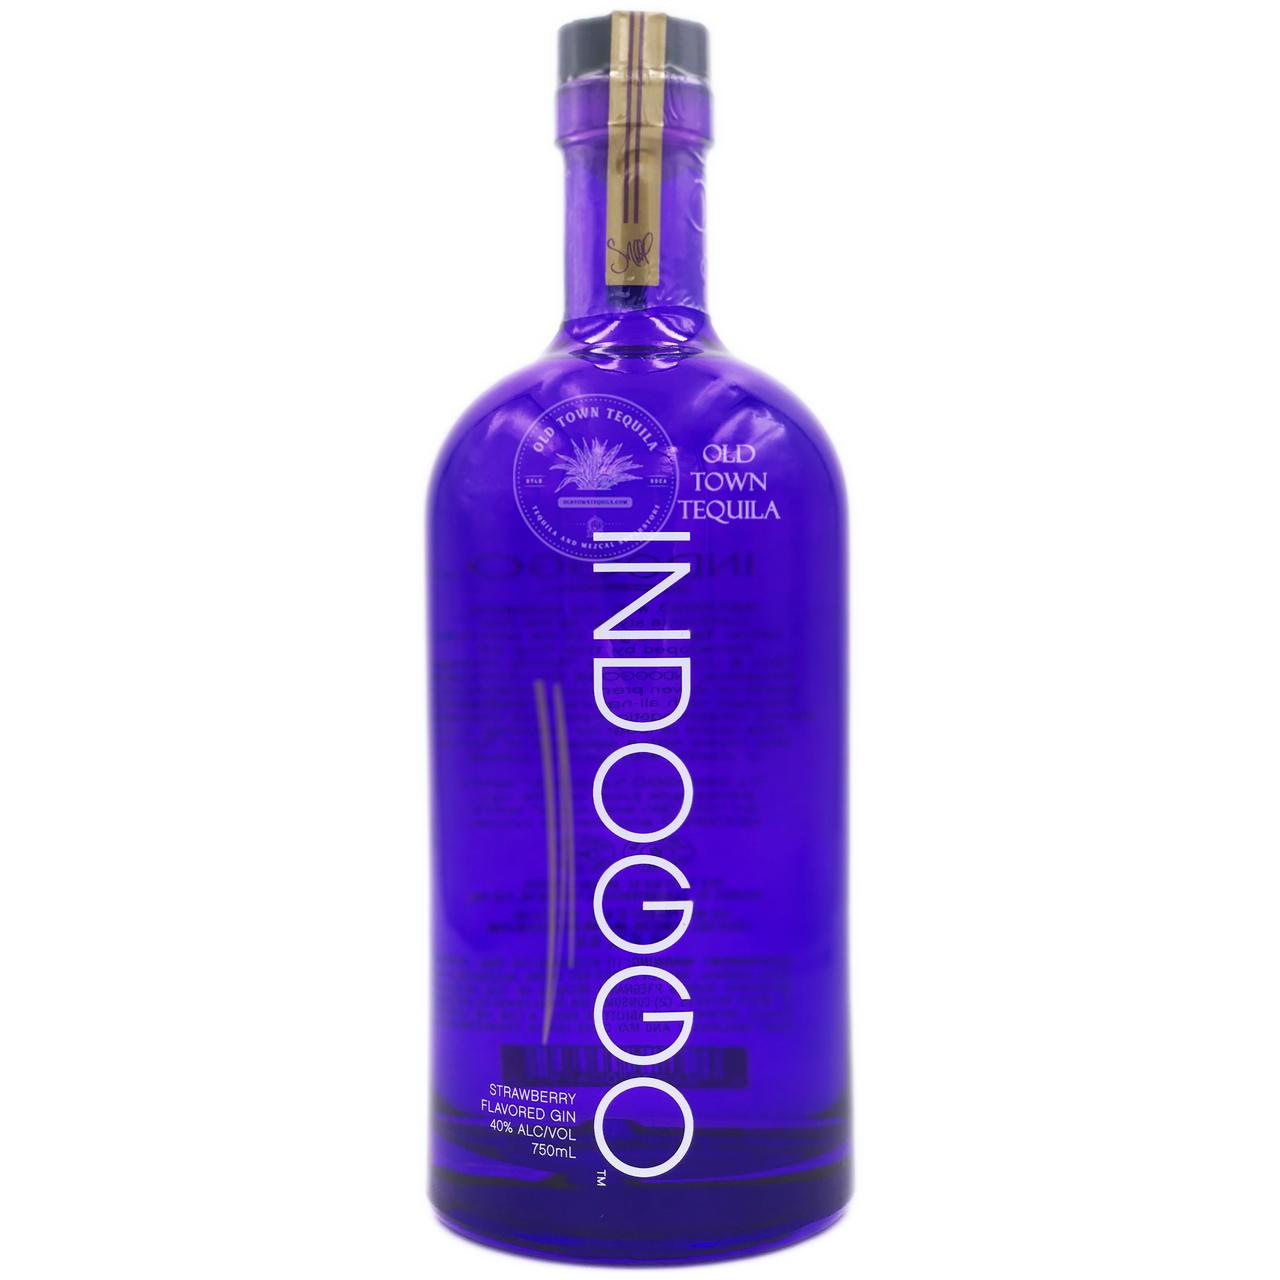 Indoggo Strawberry Gin